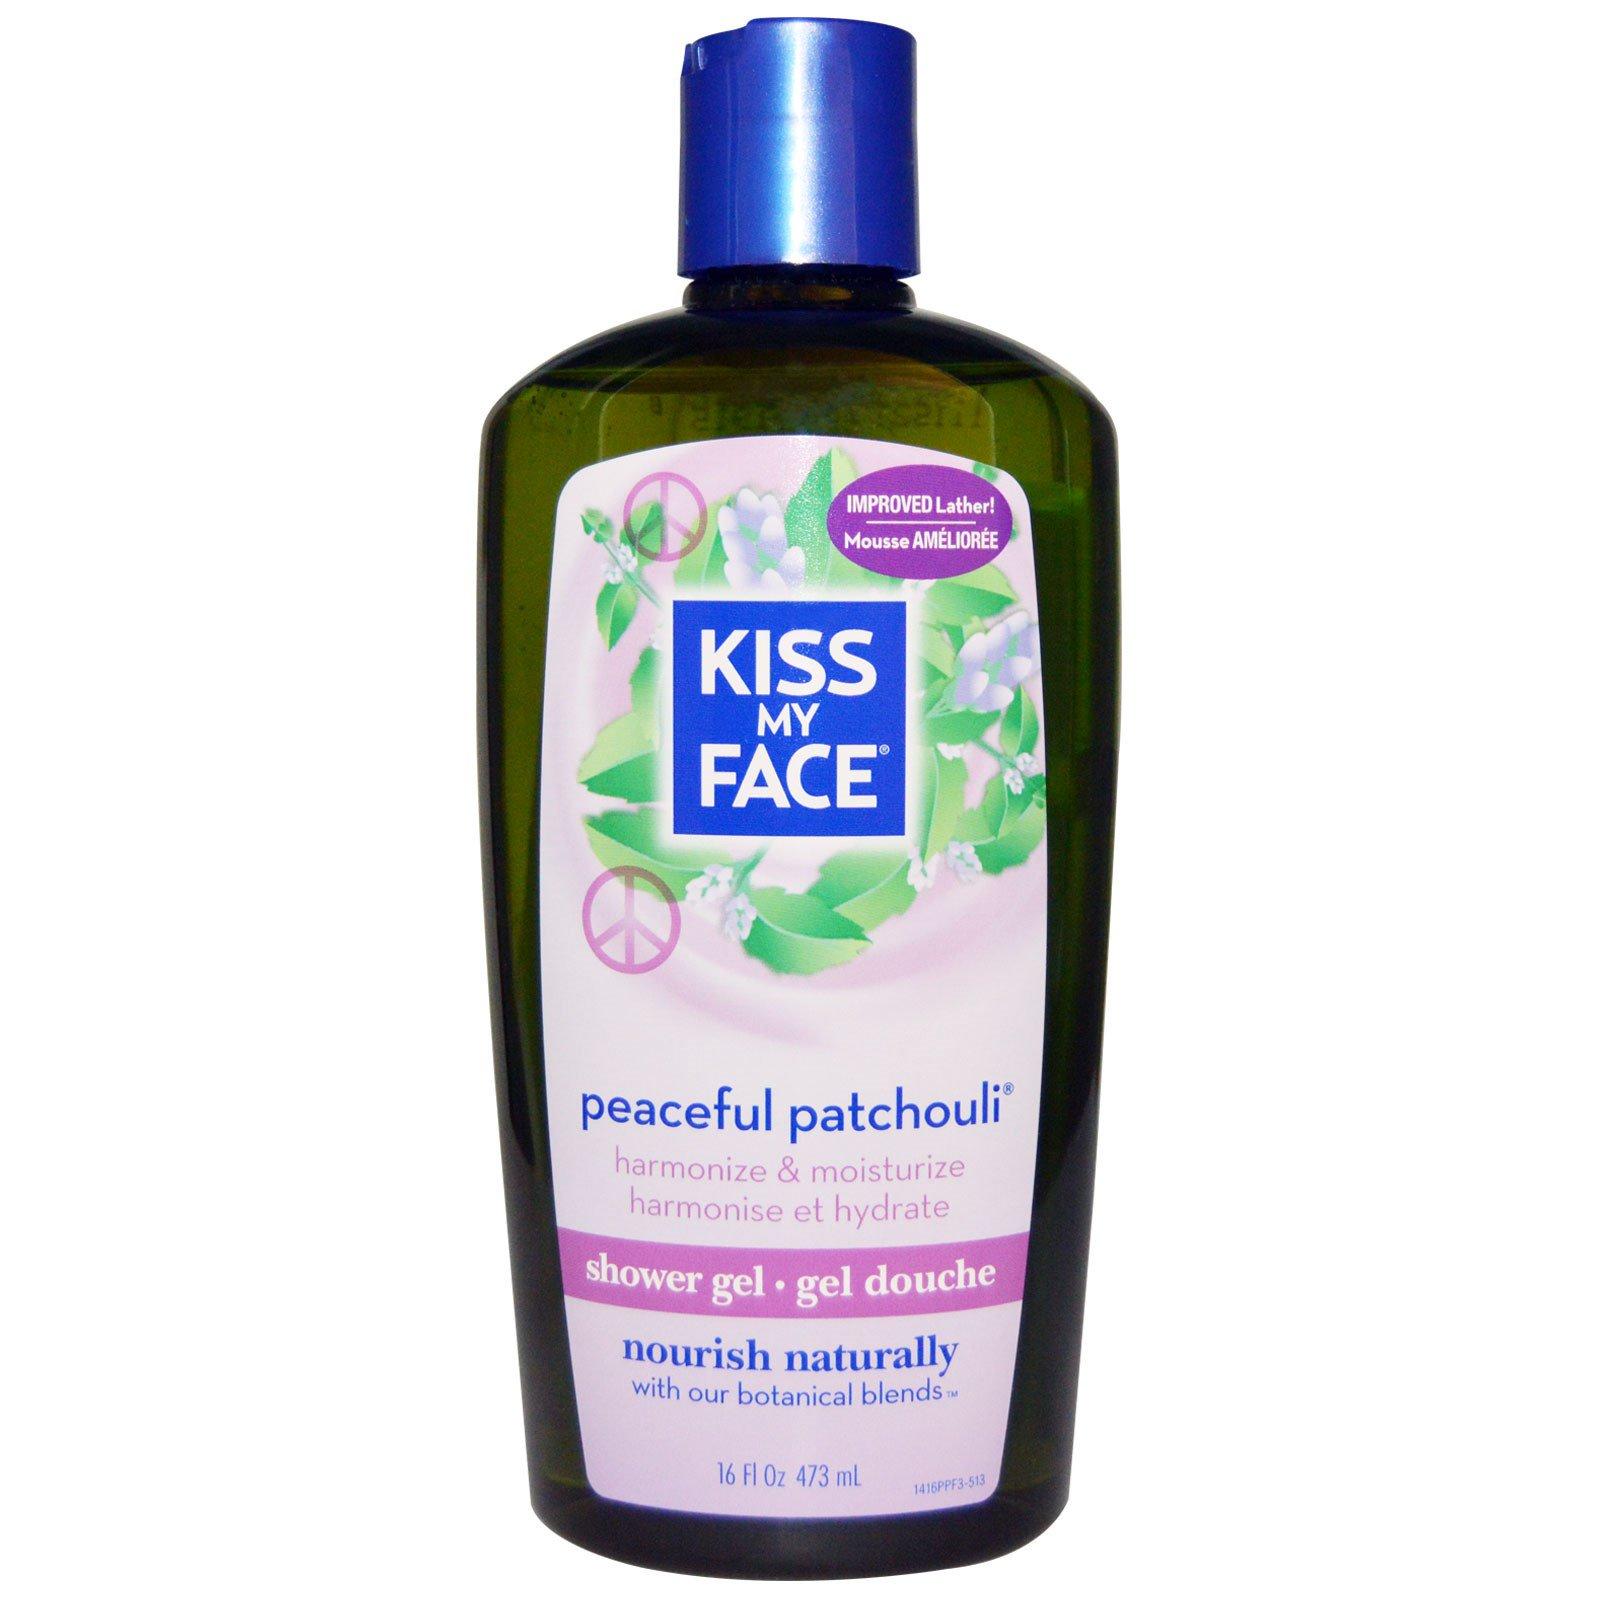 Kiss My Face, Гель для душа, умиротворяющий пачули, 16 жидких унций (473 мл)